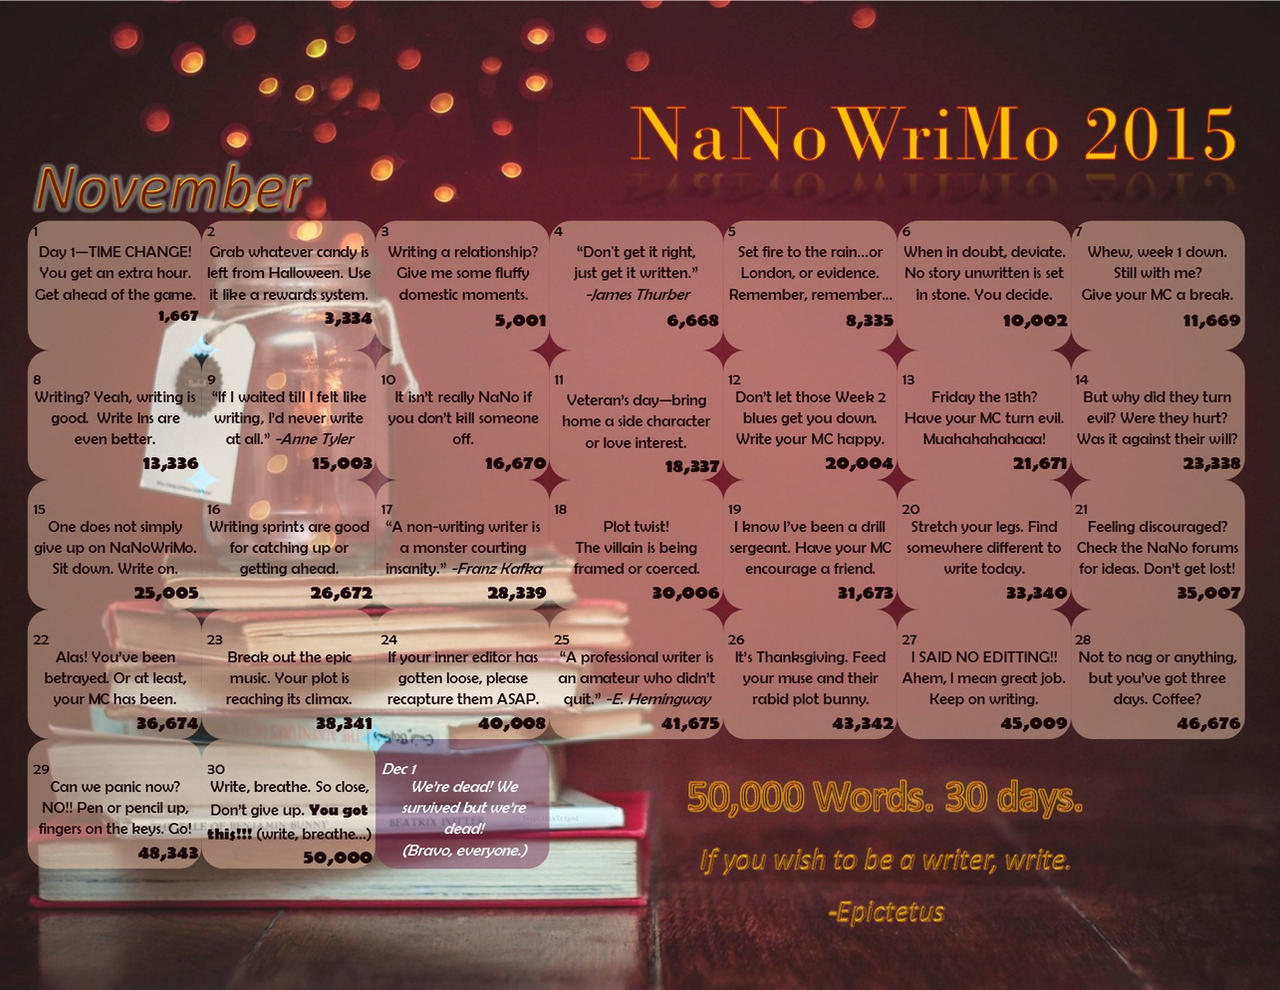 NaNo 2015 Autumn Reading